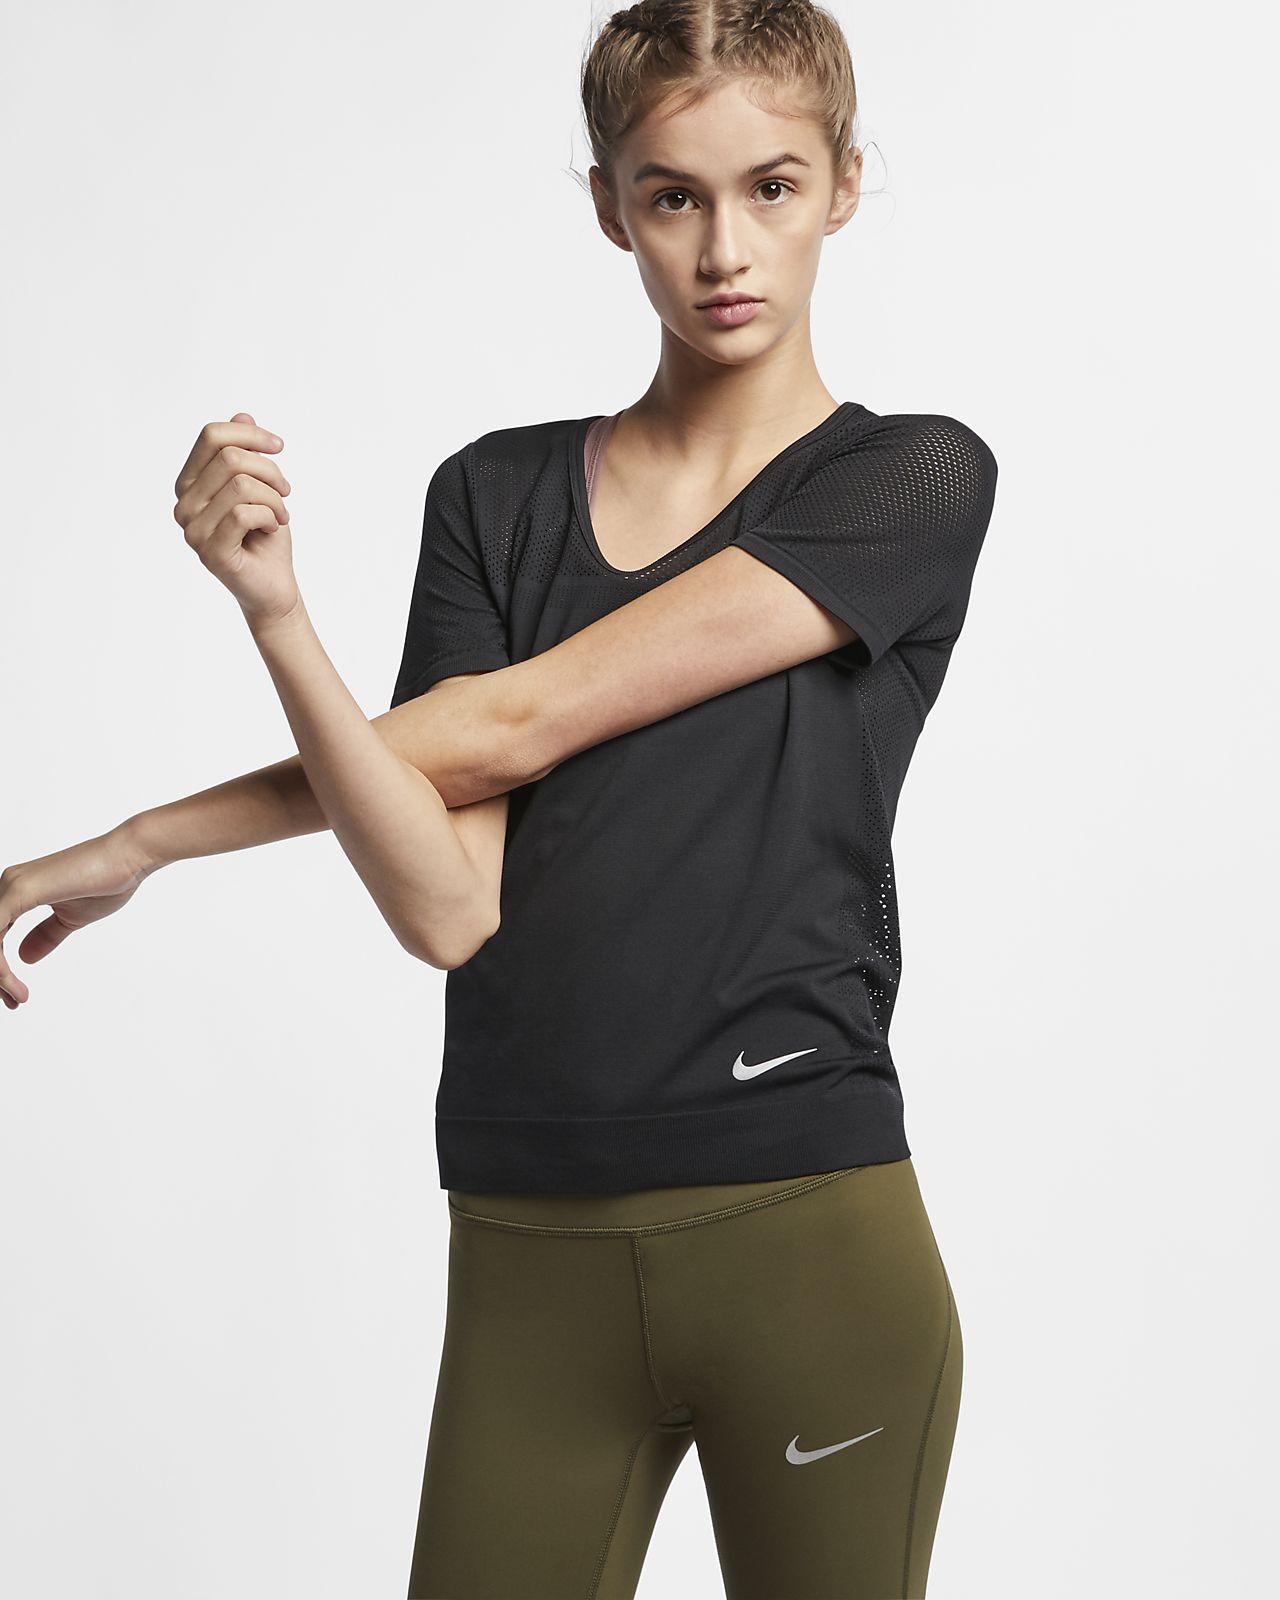 Prenda para la parte superior de running de manga corta para mujer Nike Infinite